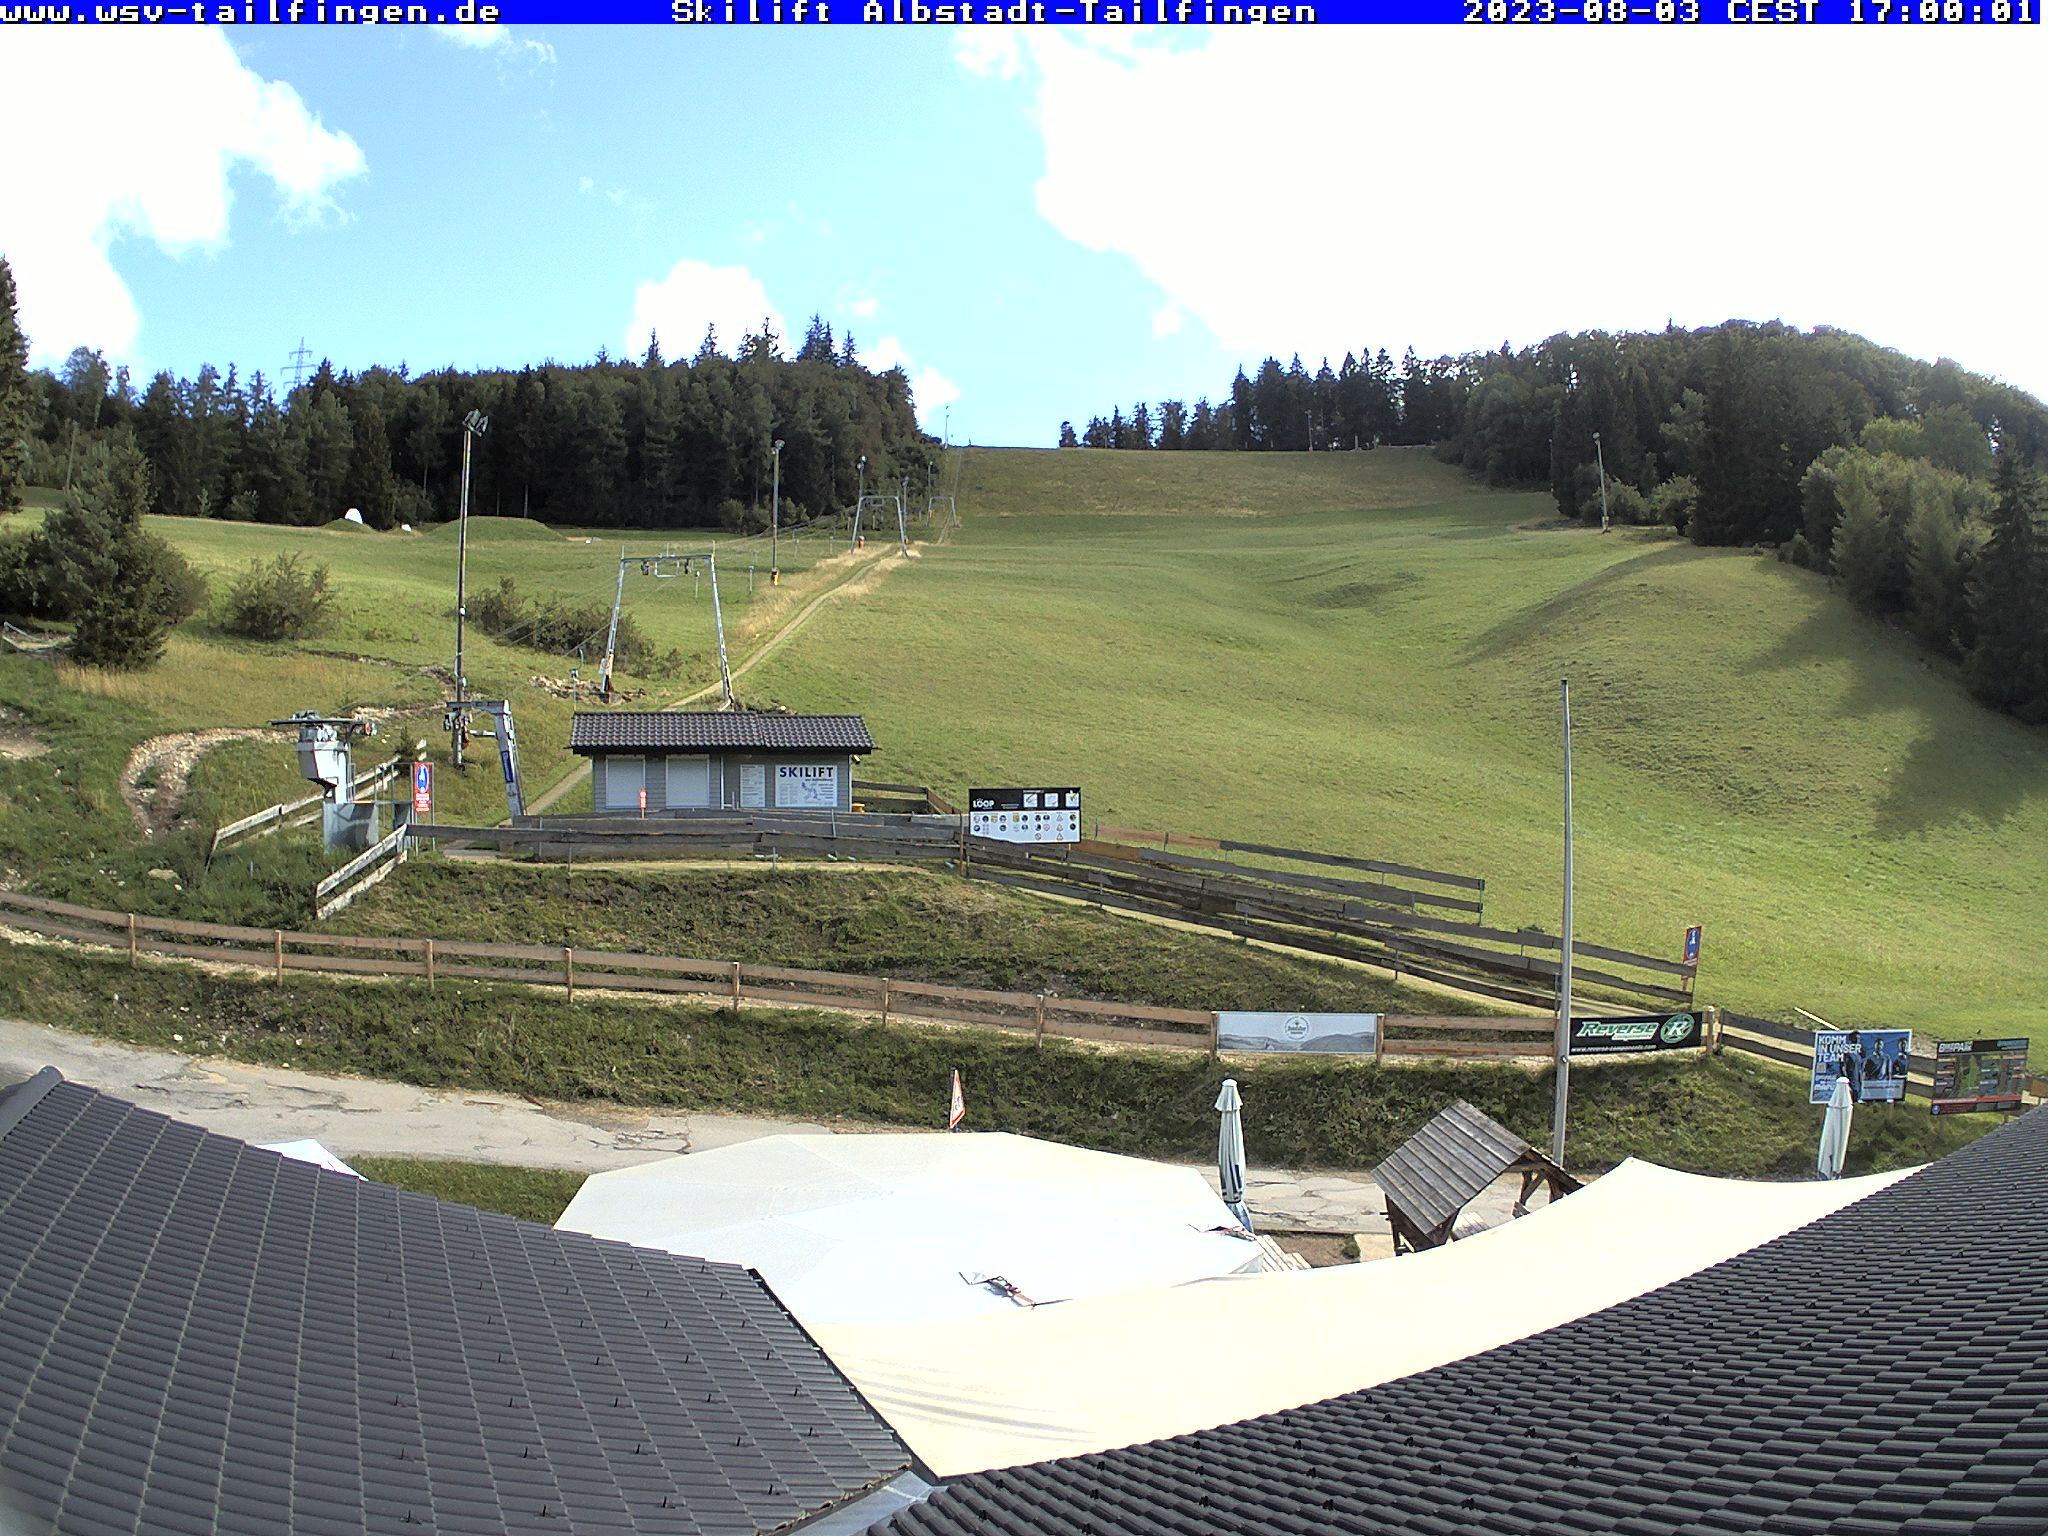 Webcam-Foto 17:00 Uhr / Skilift Albstadt-Tailfingen